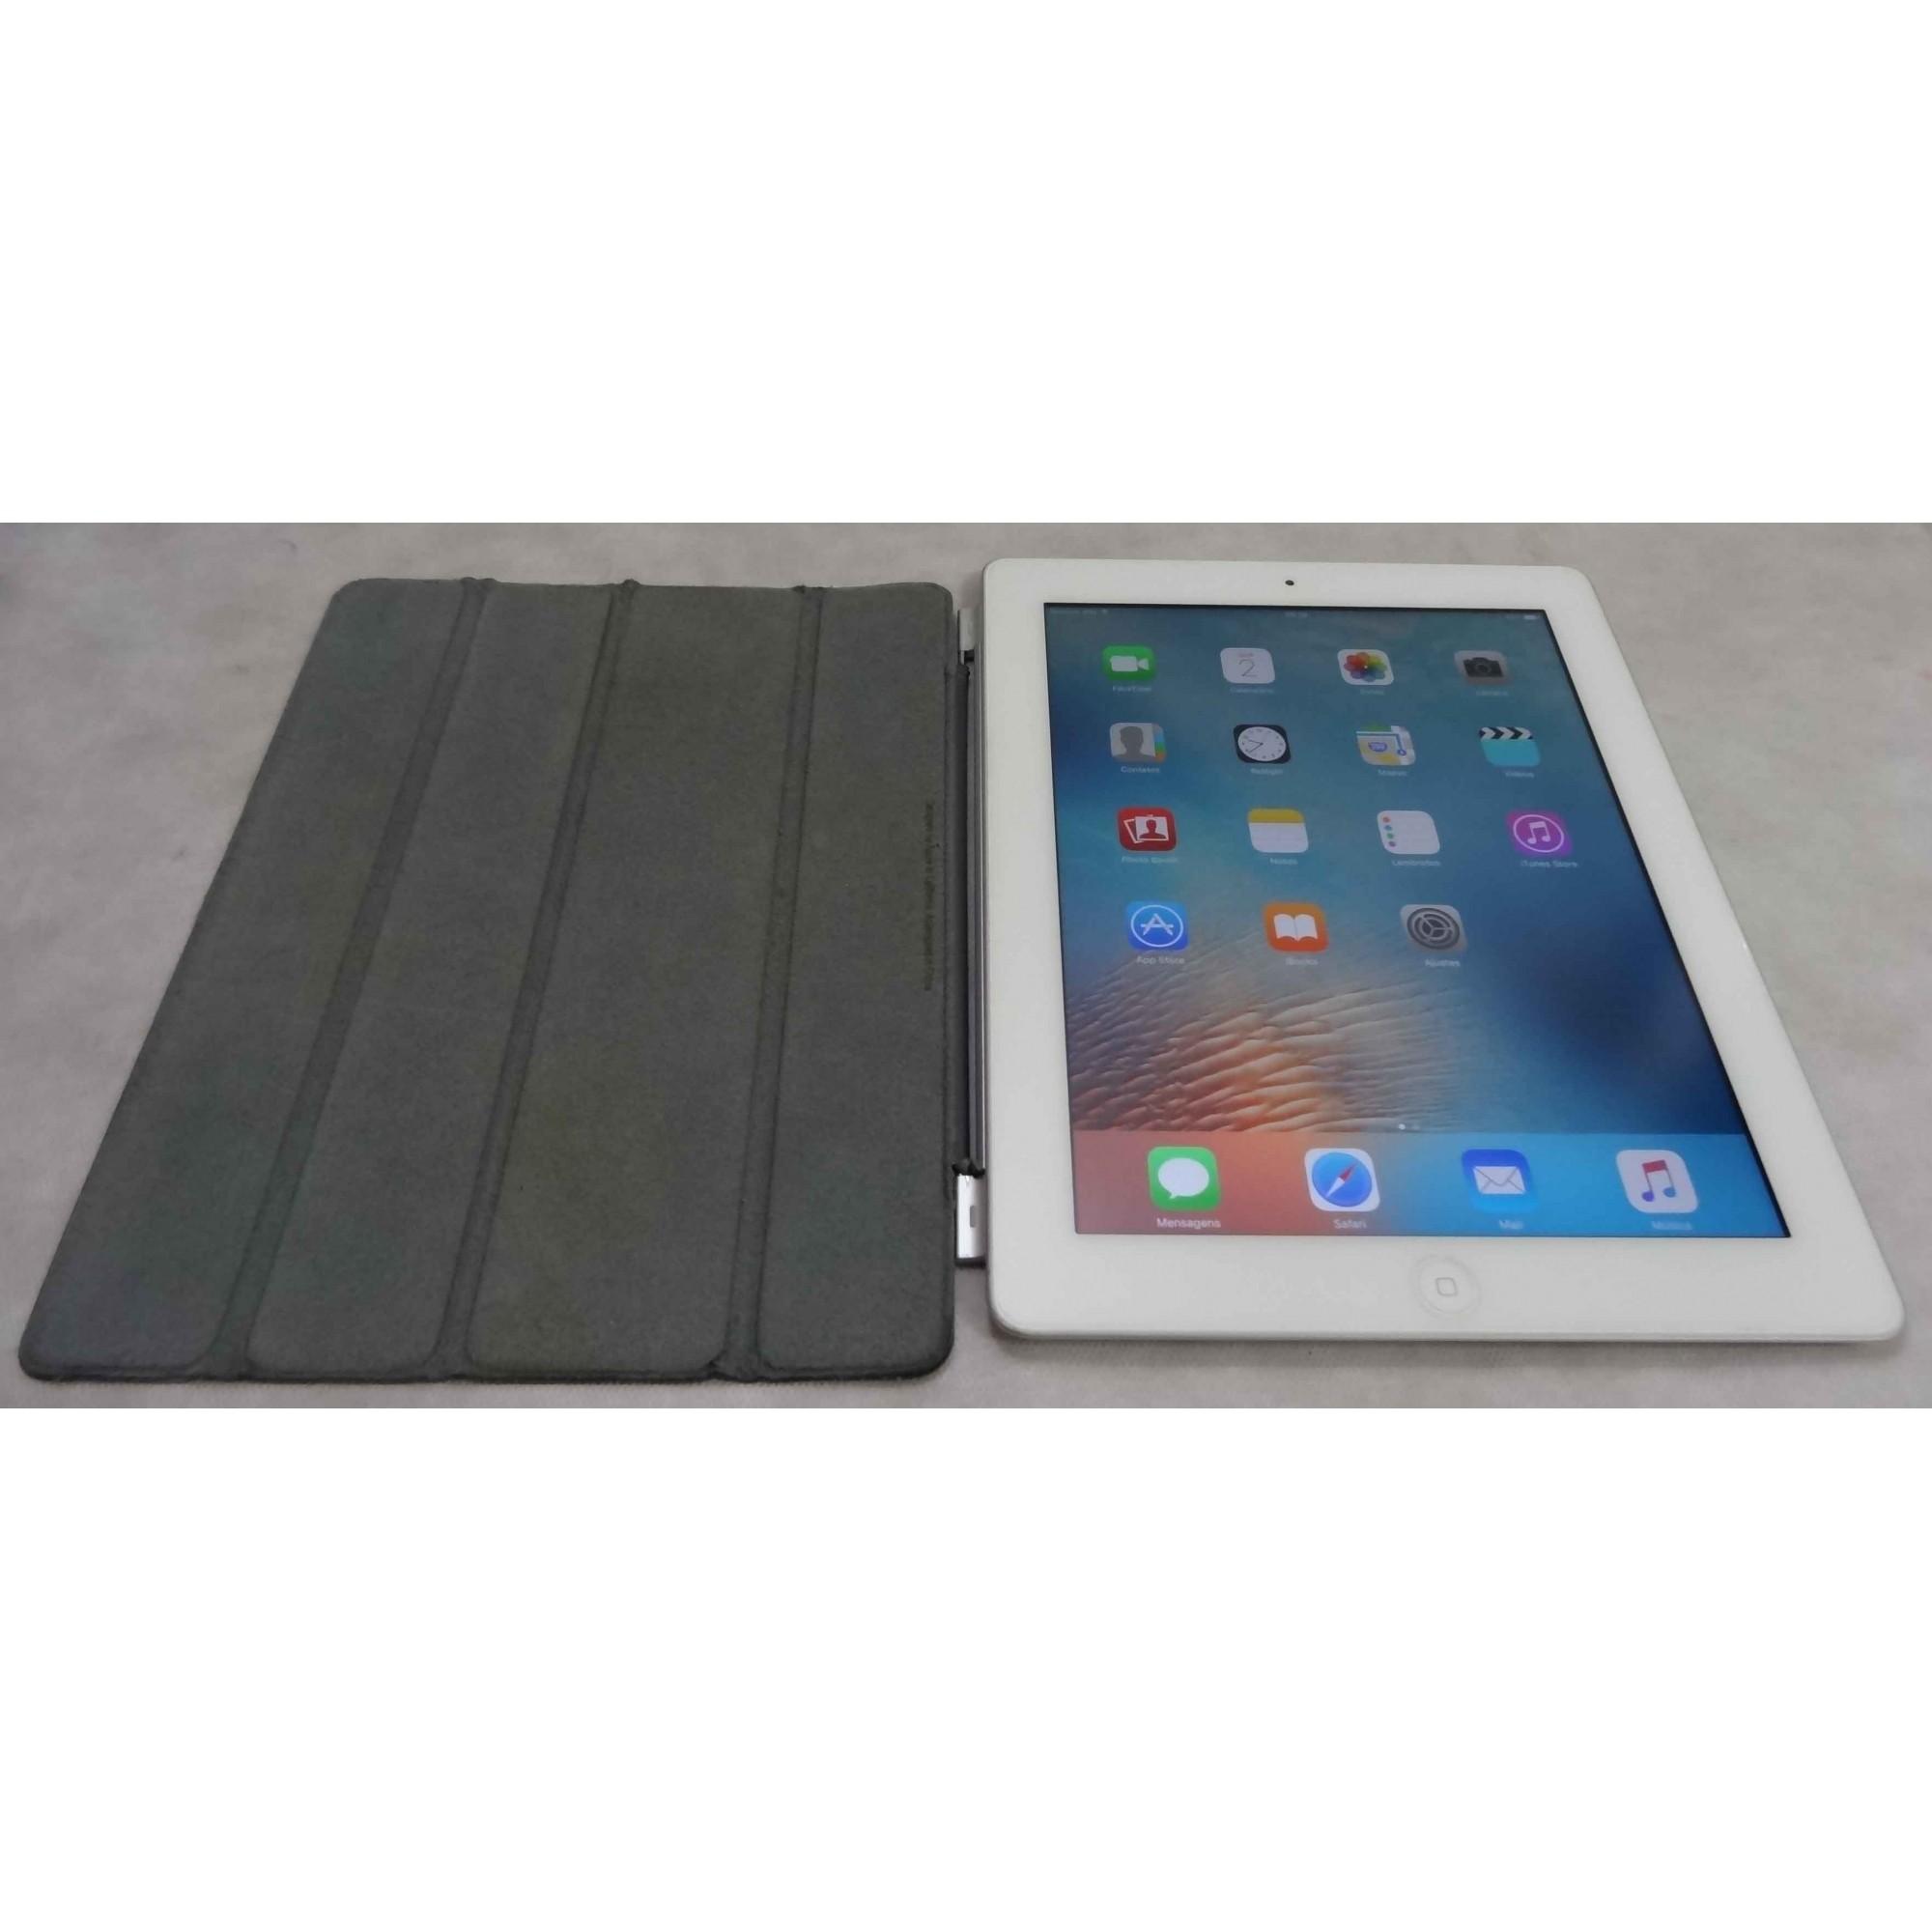 iPad 3A Geração MD369BR/A  Wi-Fi, 3G, 16GB - Branco